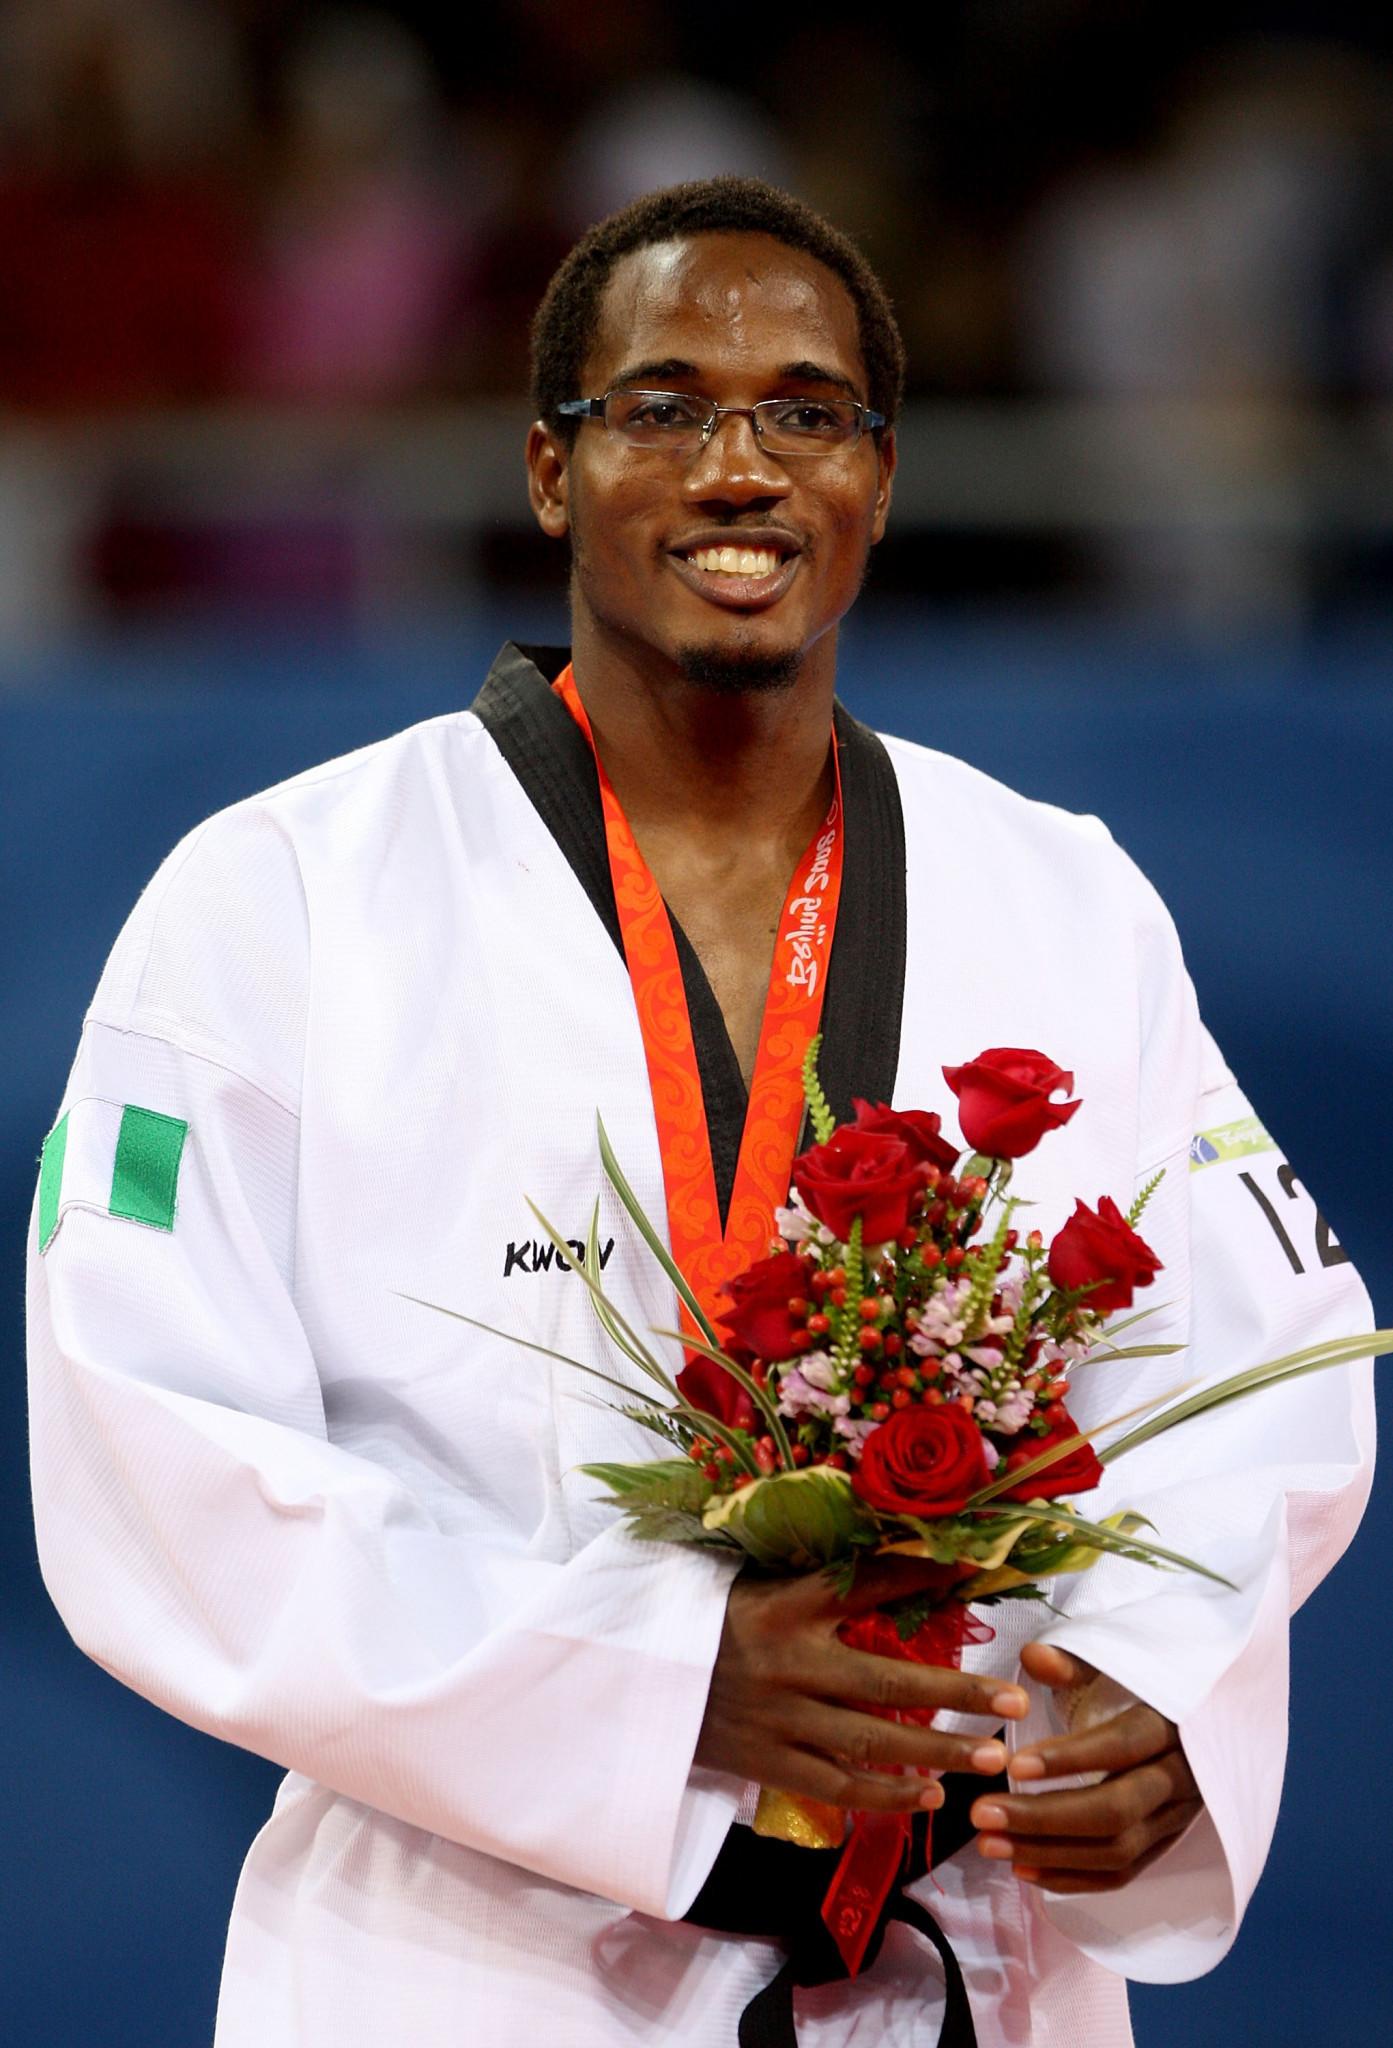 Chika Chukwumerije won Olympic bronze for Nigeria at Beijing 2008 ©Getty Images